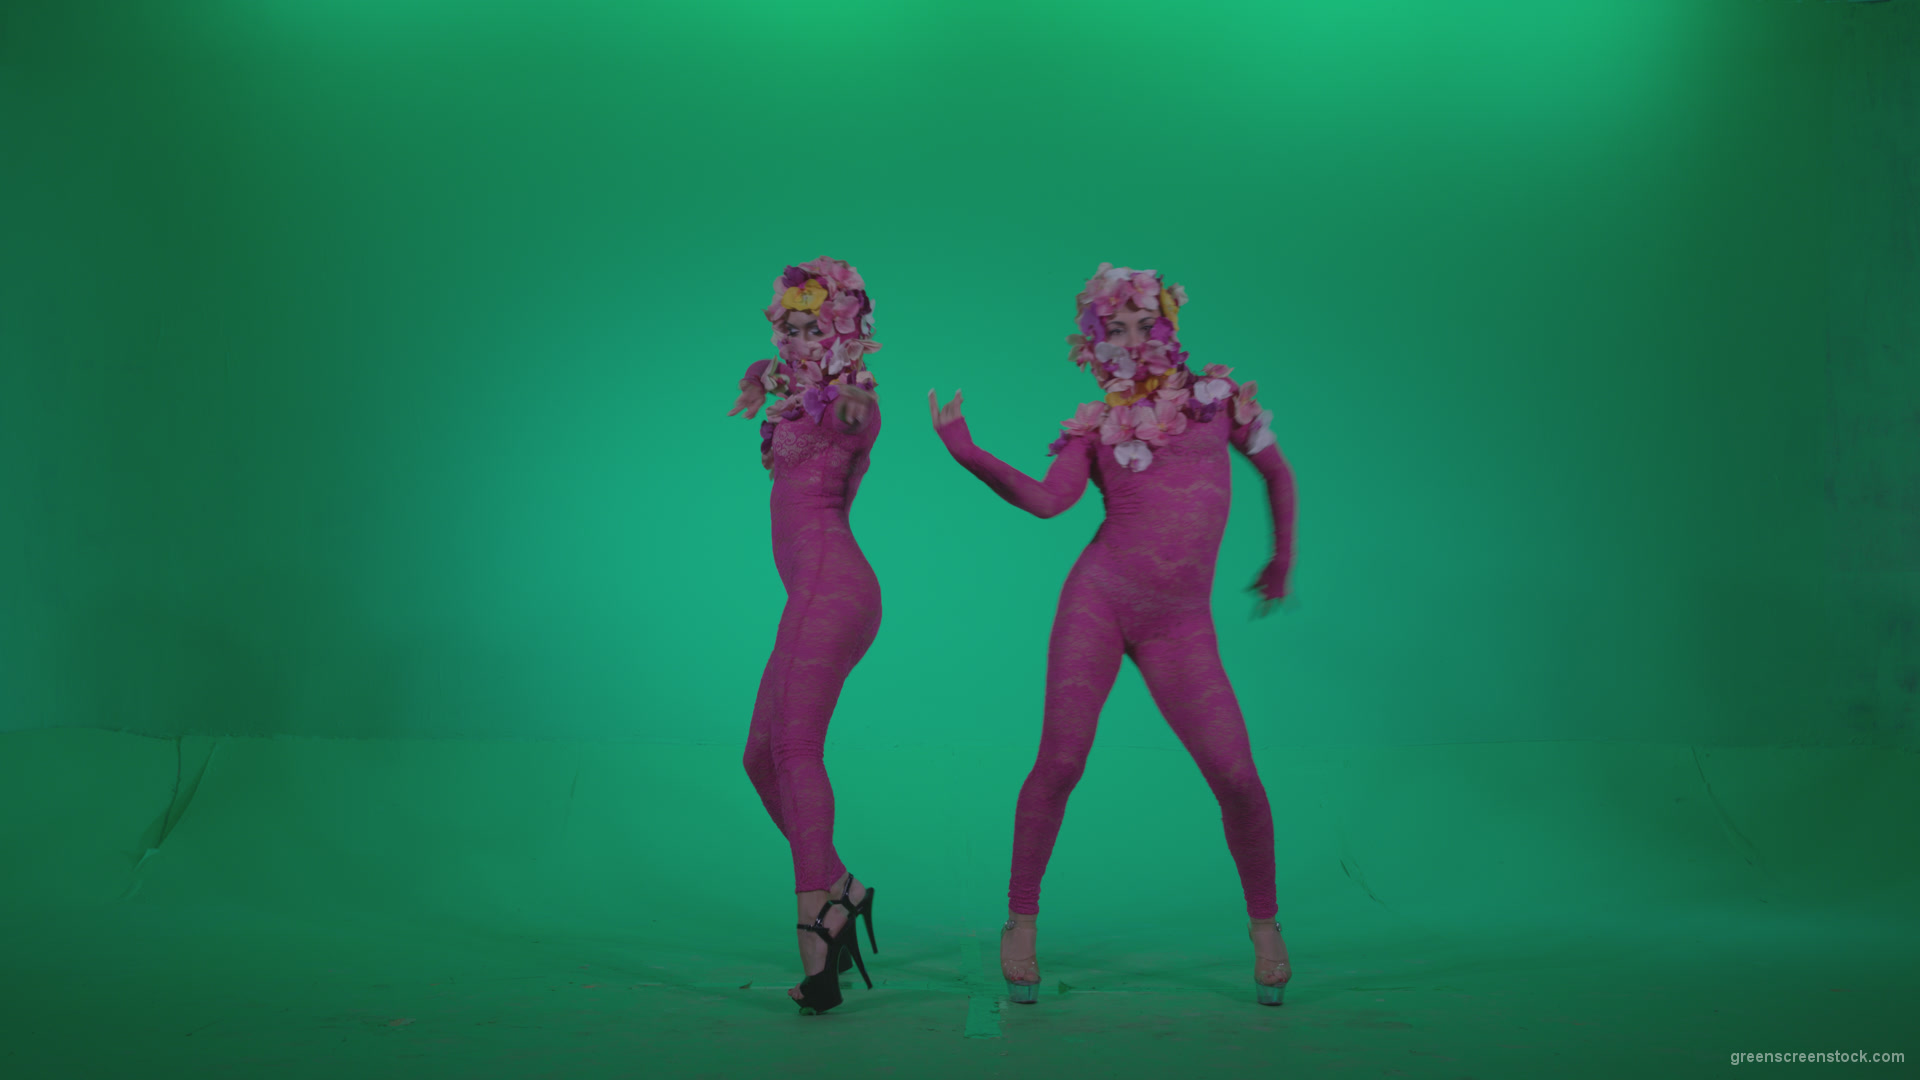 Go go dancer pink flowers f1 green screen video footage video go go dancer pink flowers f1 green screen mightylinksfo